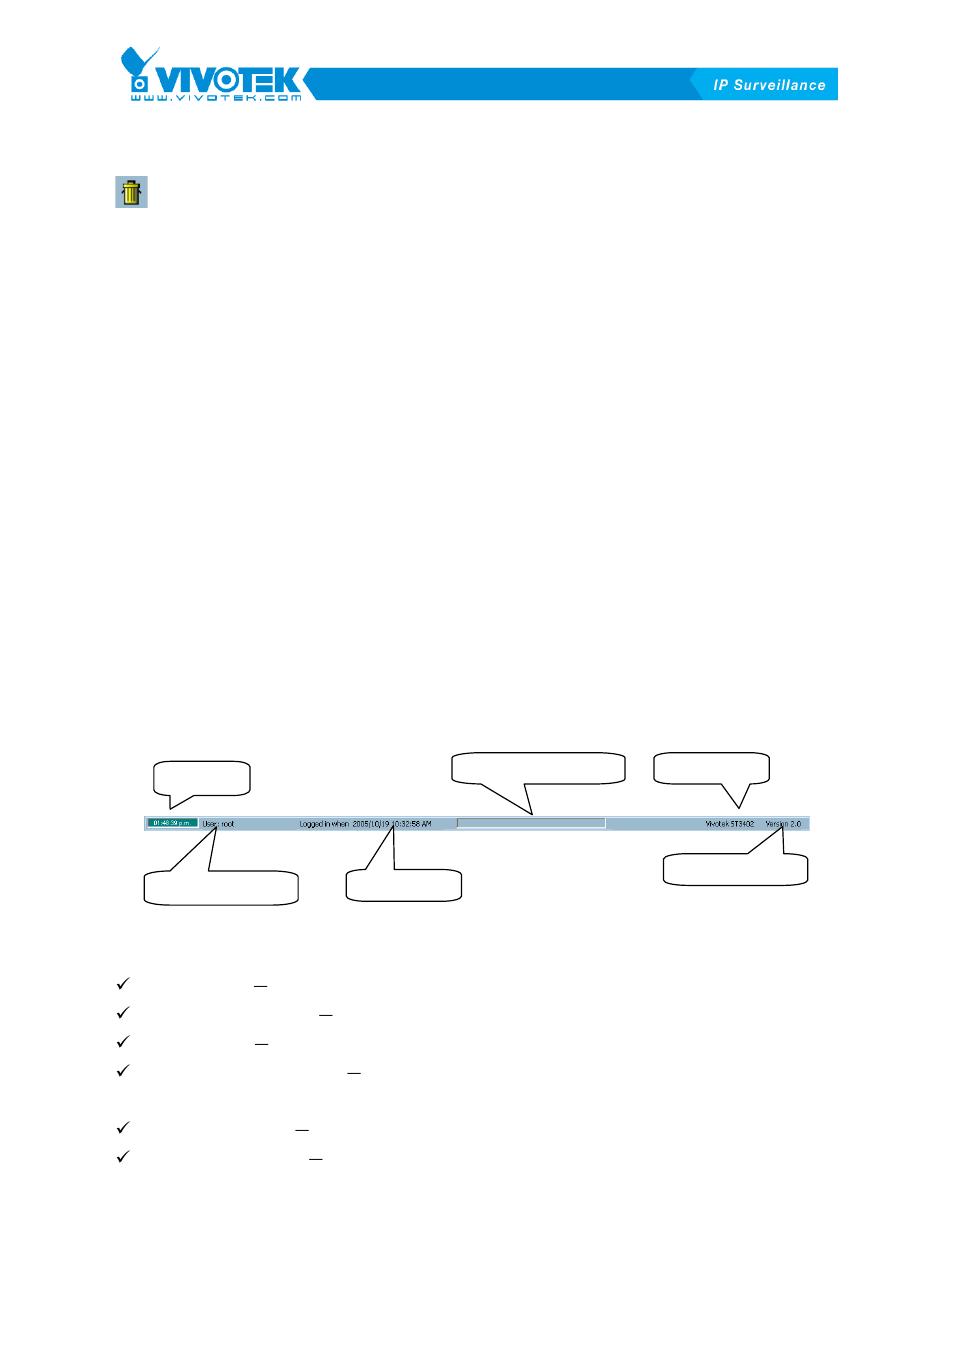 multiple focus status bar vivotek st3402 user manual page 58 rh manualsdir com Code of Virginia 8.01 MIT Physics 8.01